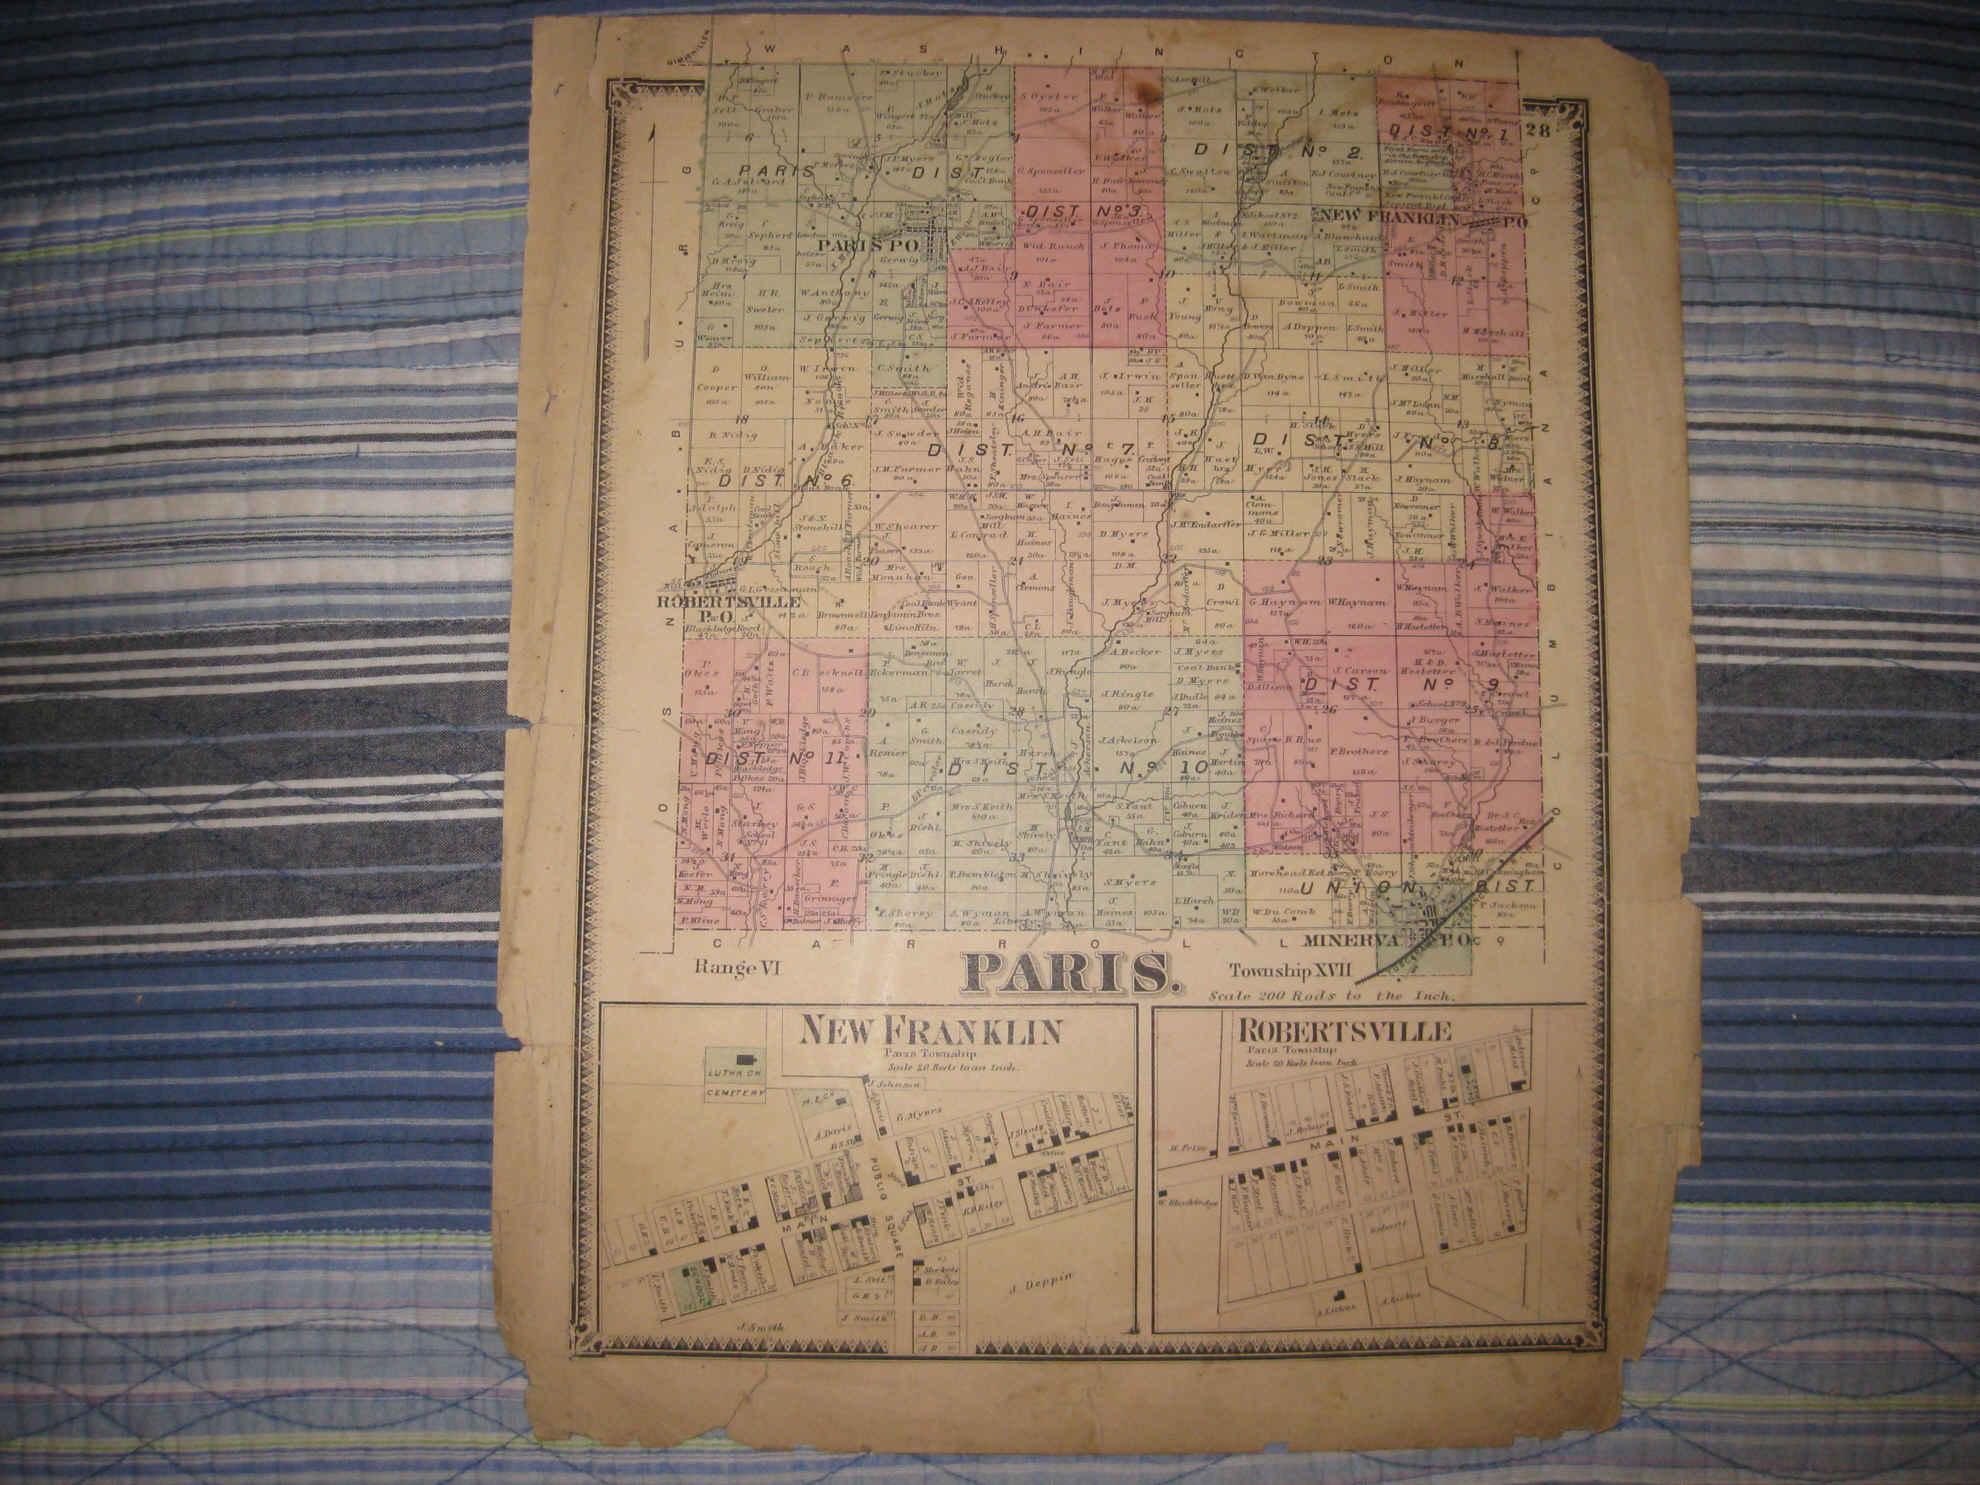 New Paris Ohio Map.Antique 1870 Paris Township Minerva New Franklin Stark County Ohio